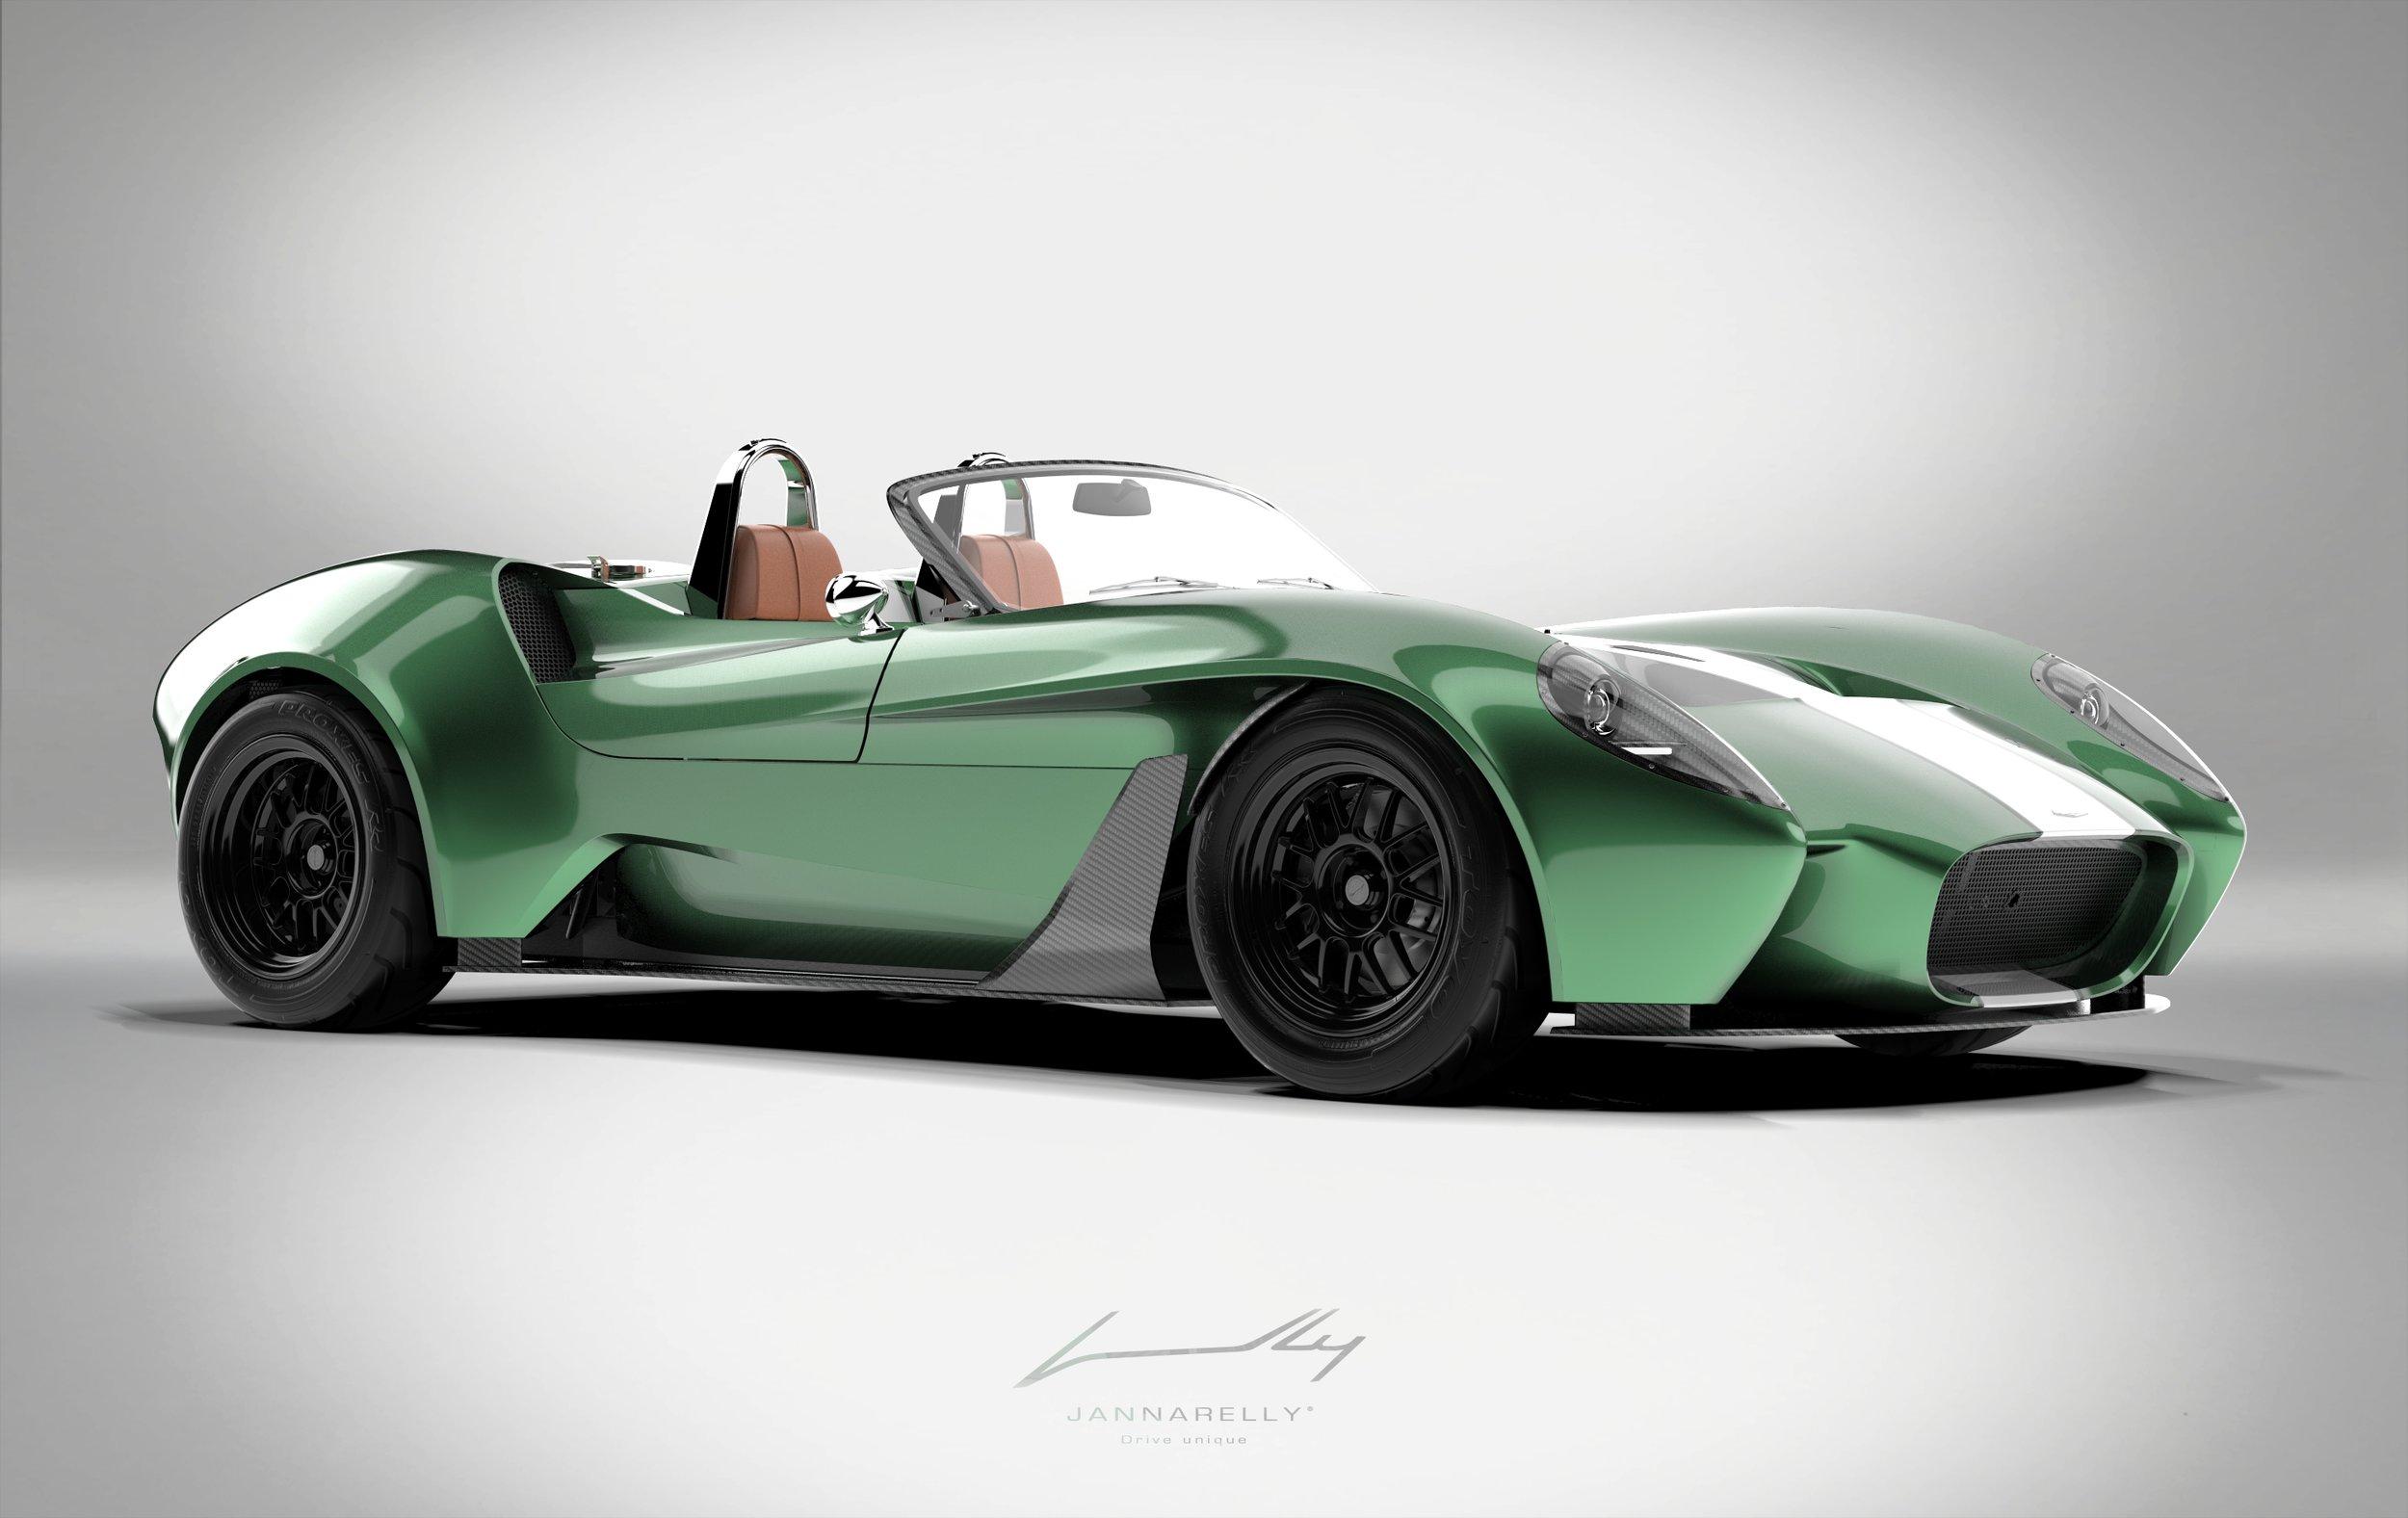 J design1 roadster.327.jpg